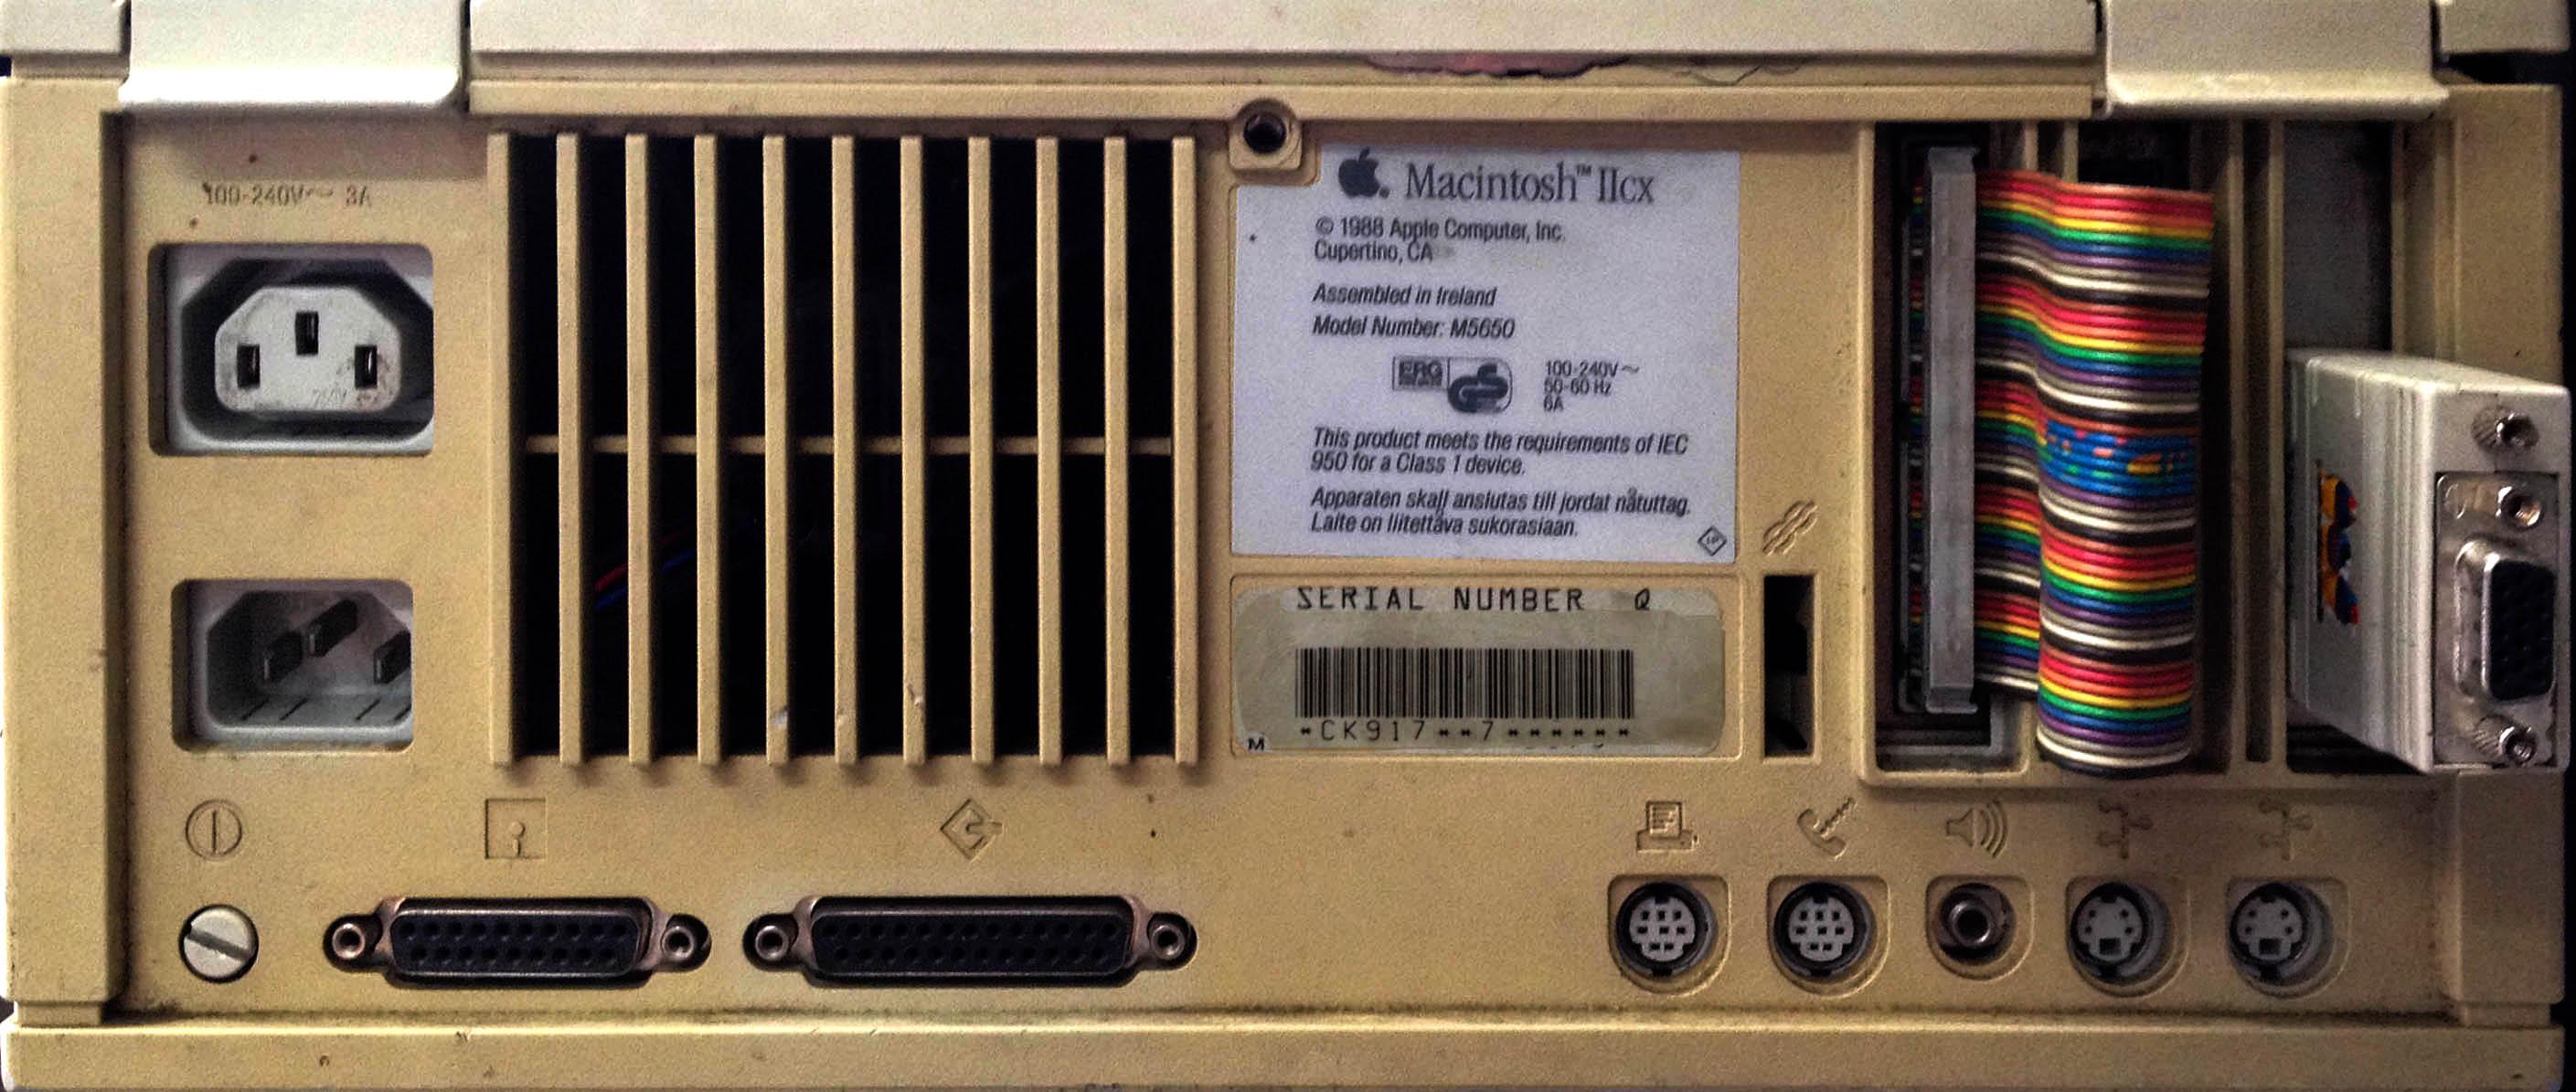 Macintosh IIcx Rear Panel